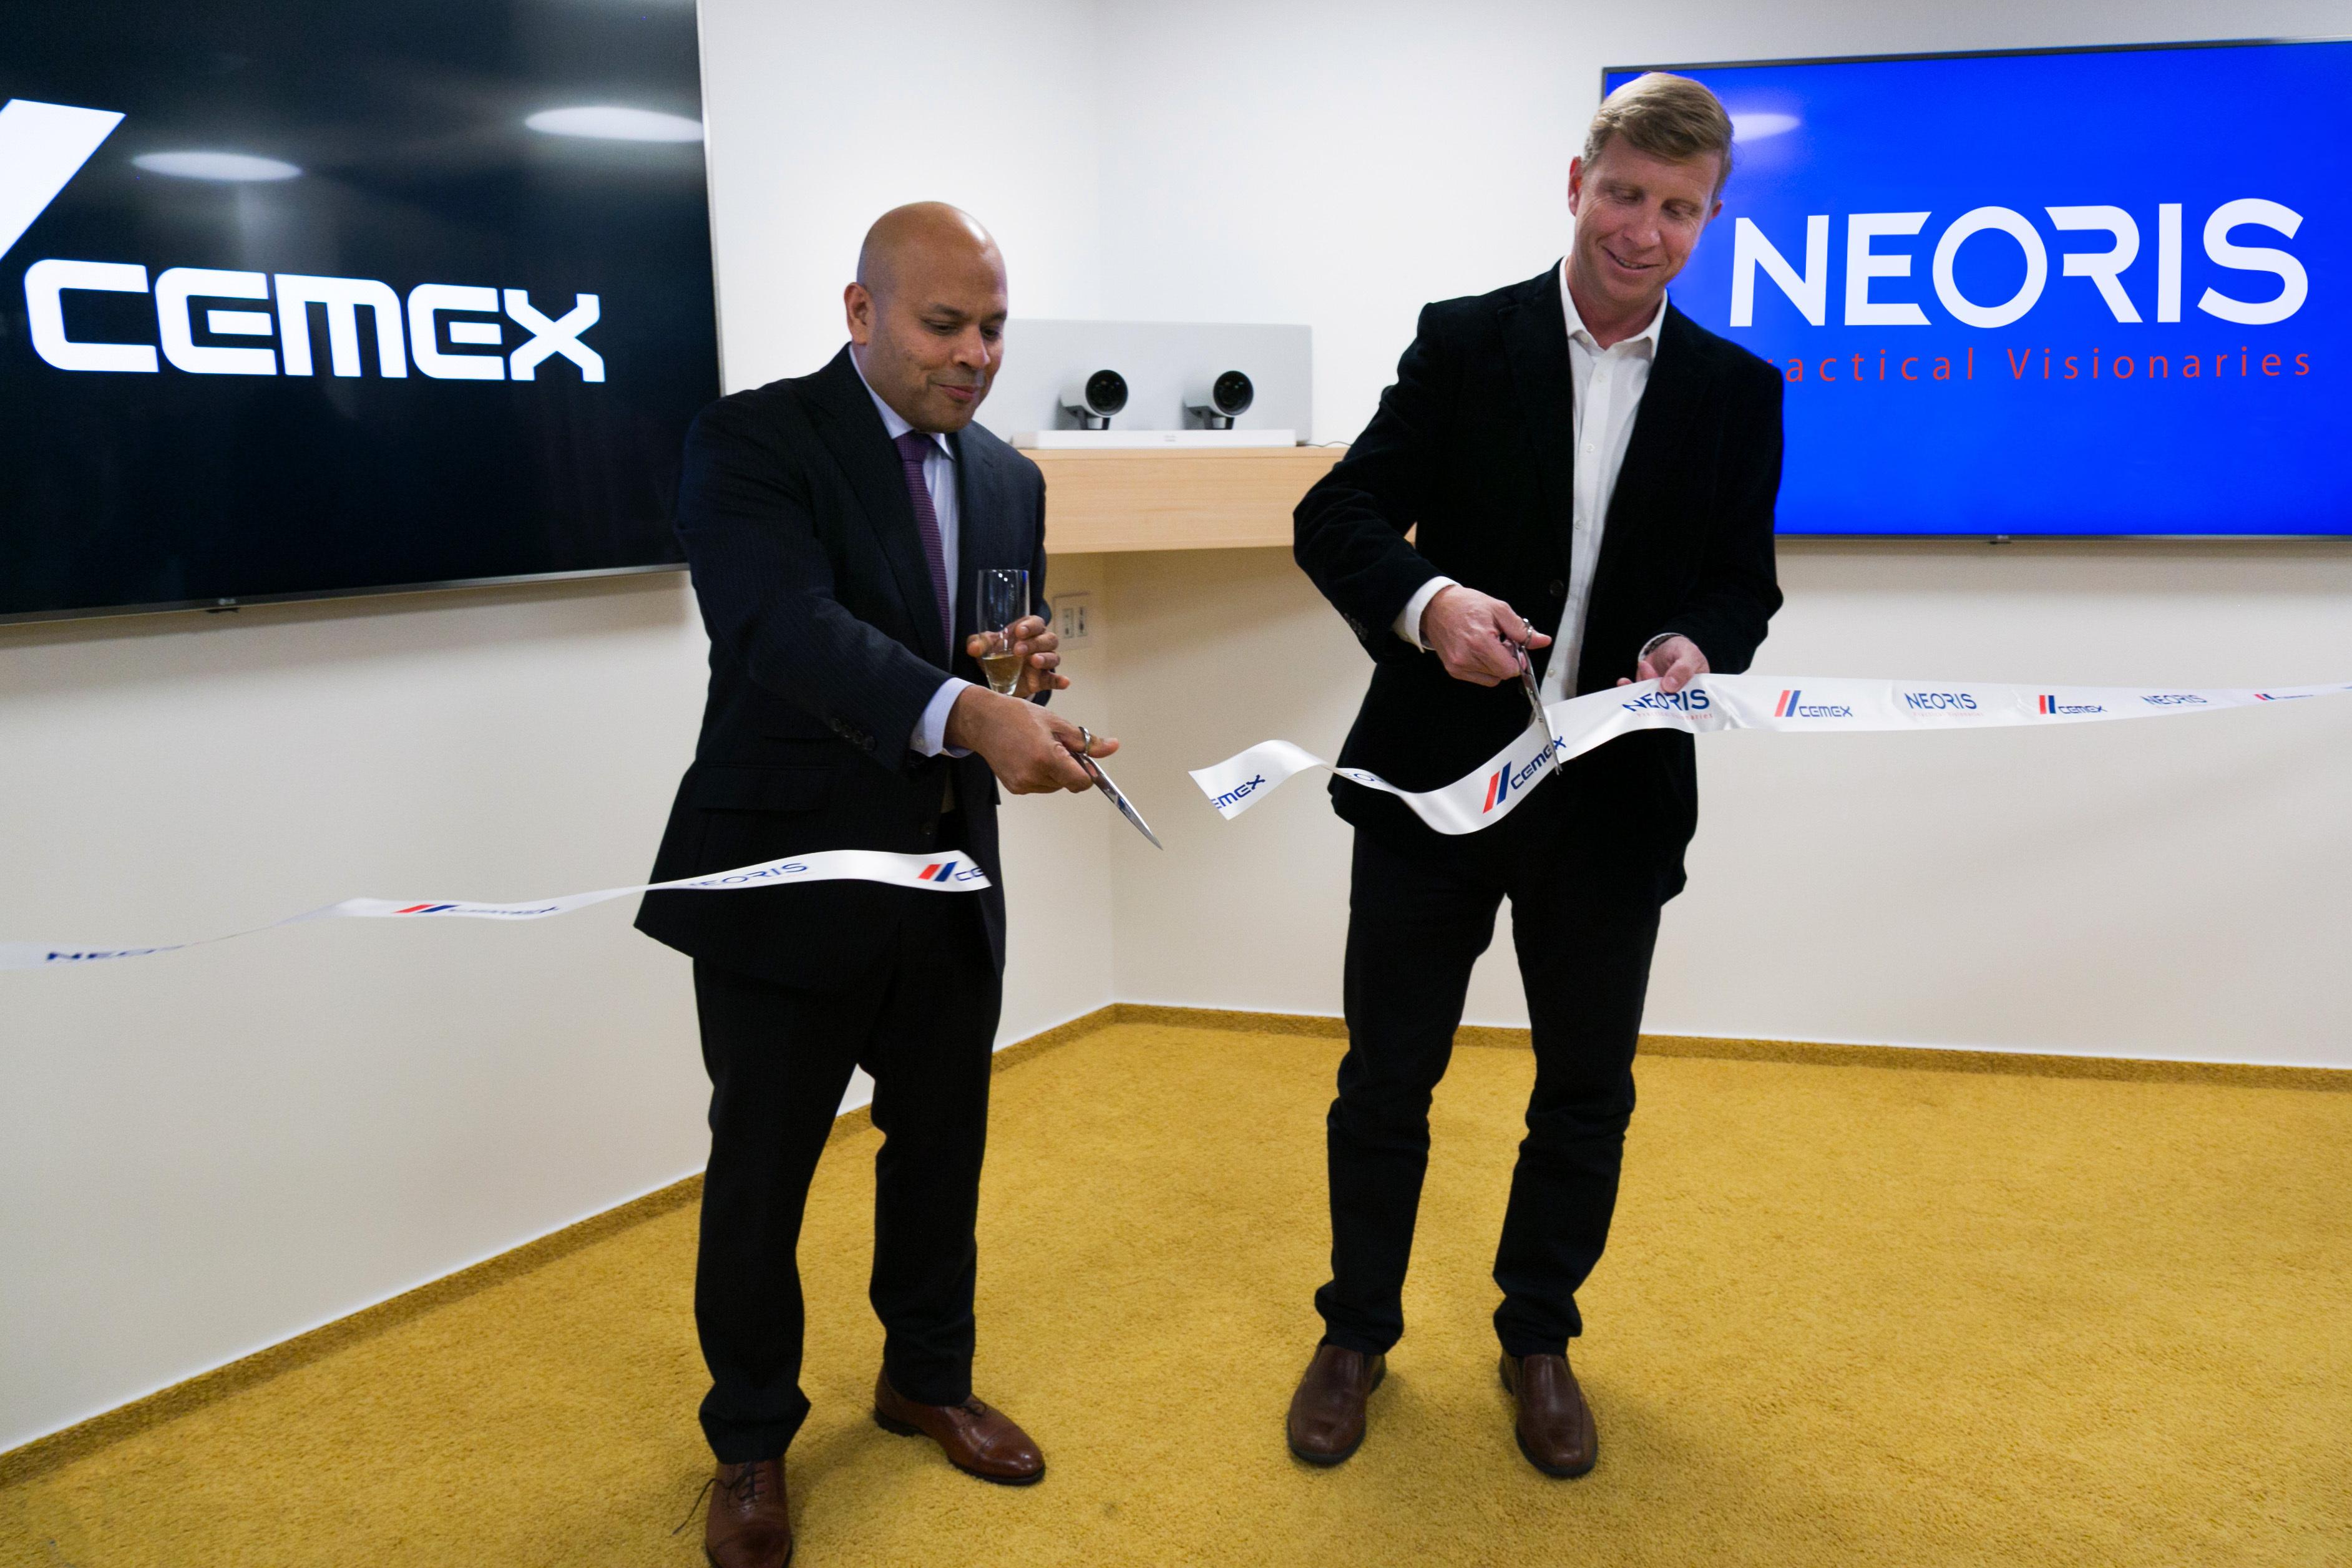 CEMEXのArun Aggarwal(CIO)とNEORISのMartin Mendez(CEO)、チェコ・プラハでの開所式にて(写真:ビジネスワイヤ)